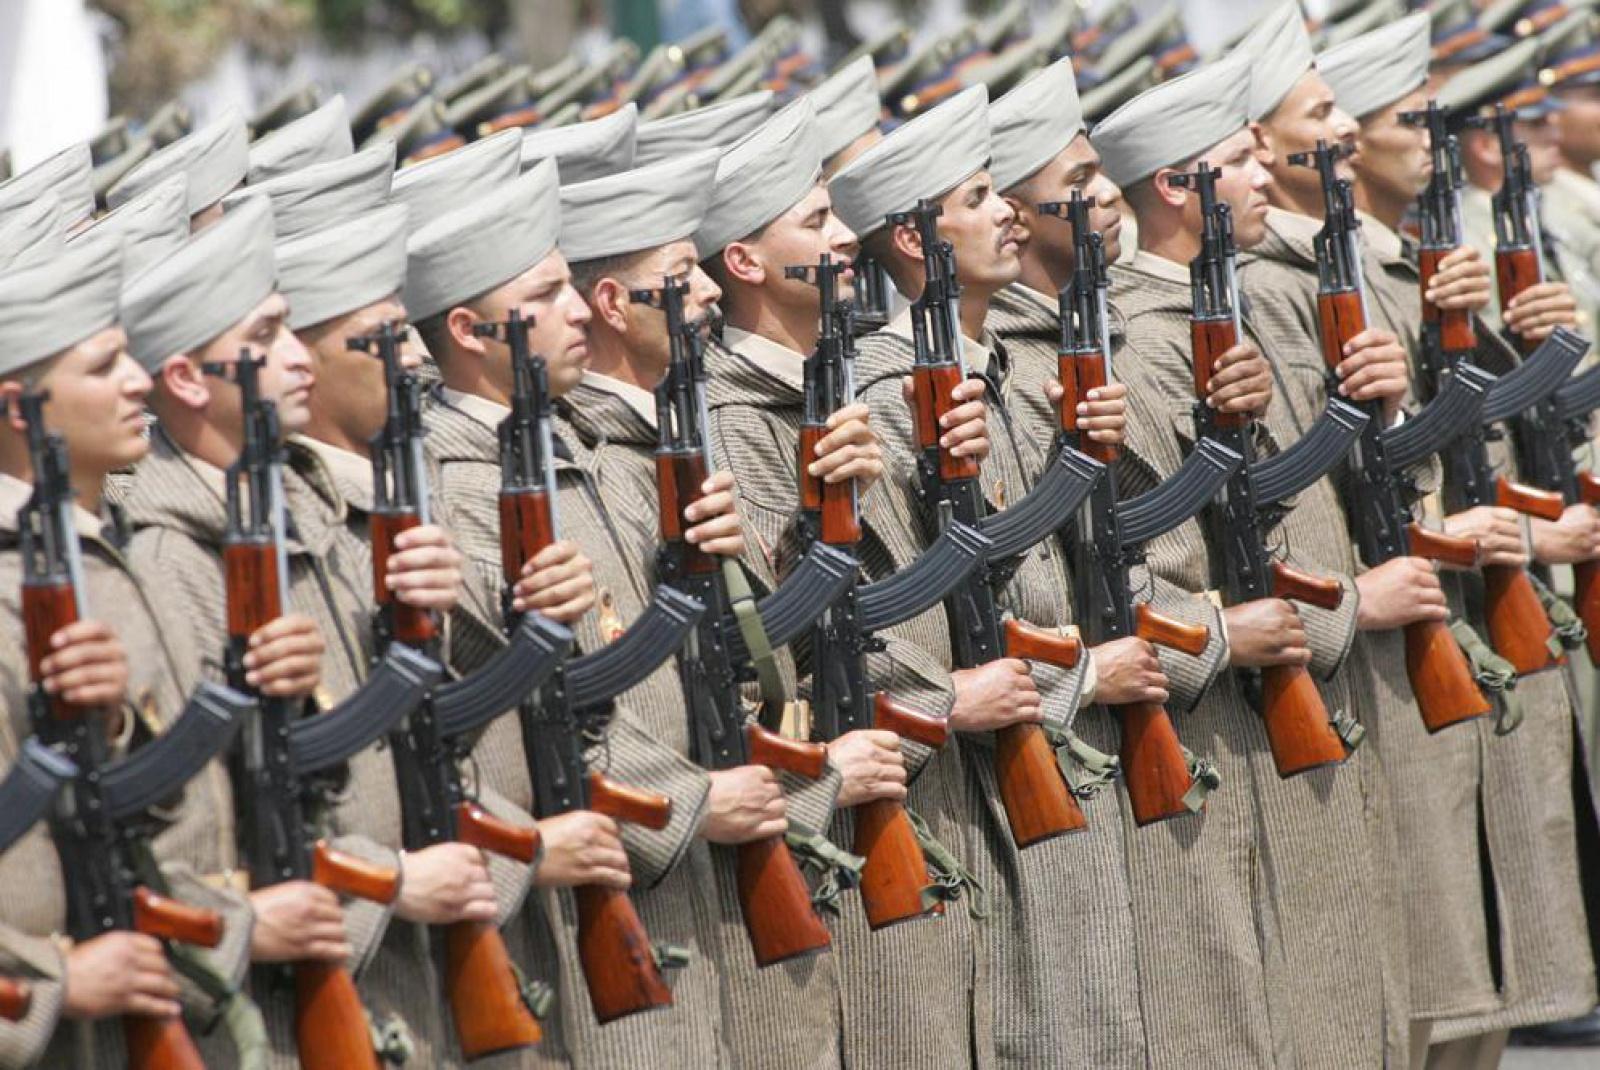 Armes d'Infanterie chez les FAR / Moroccan Small Arms Inventory - Page 7 218675Soldadosmarroquies